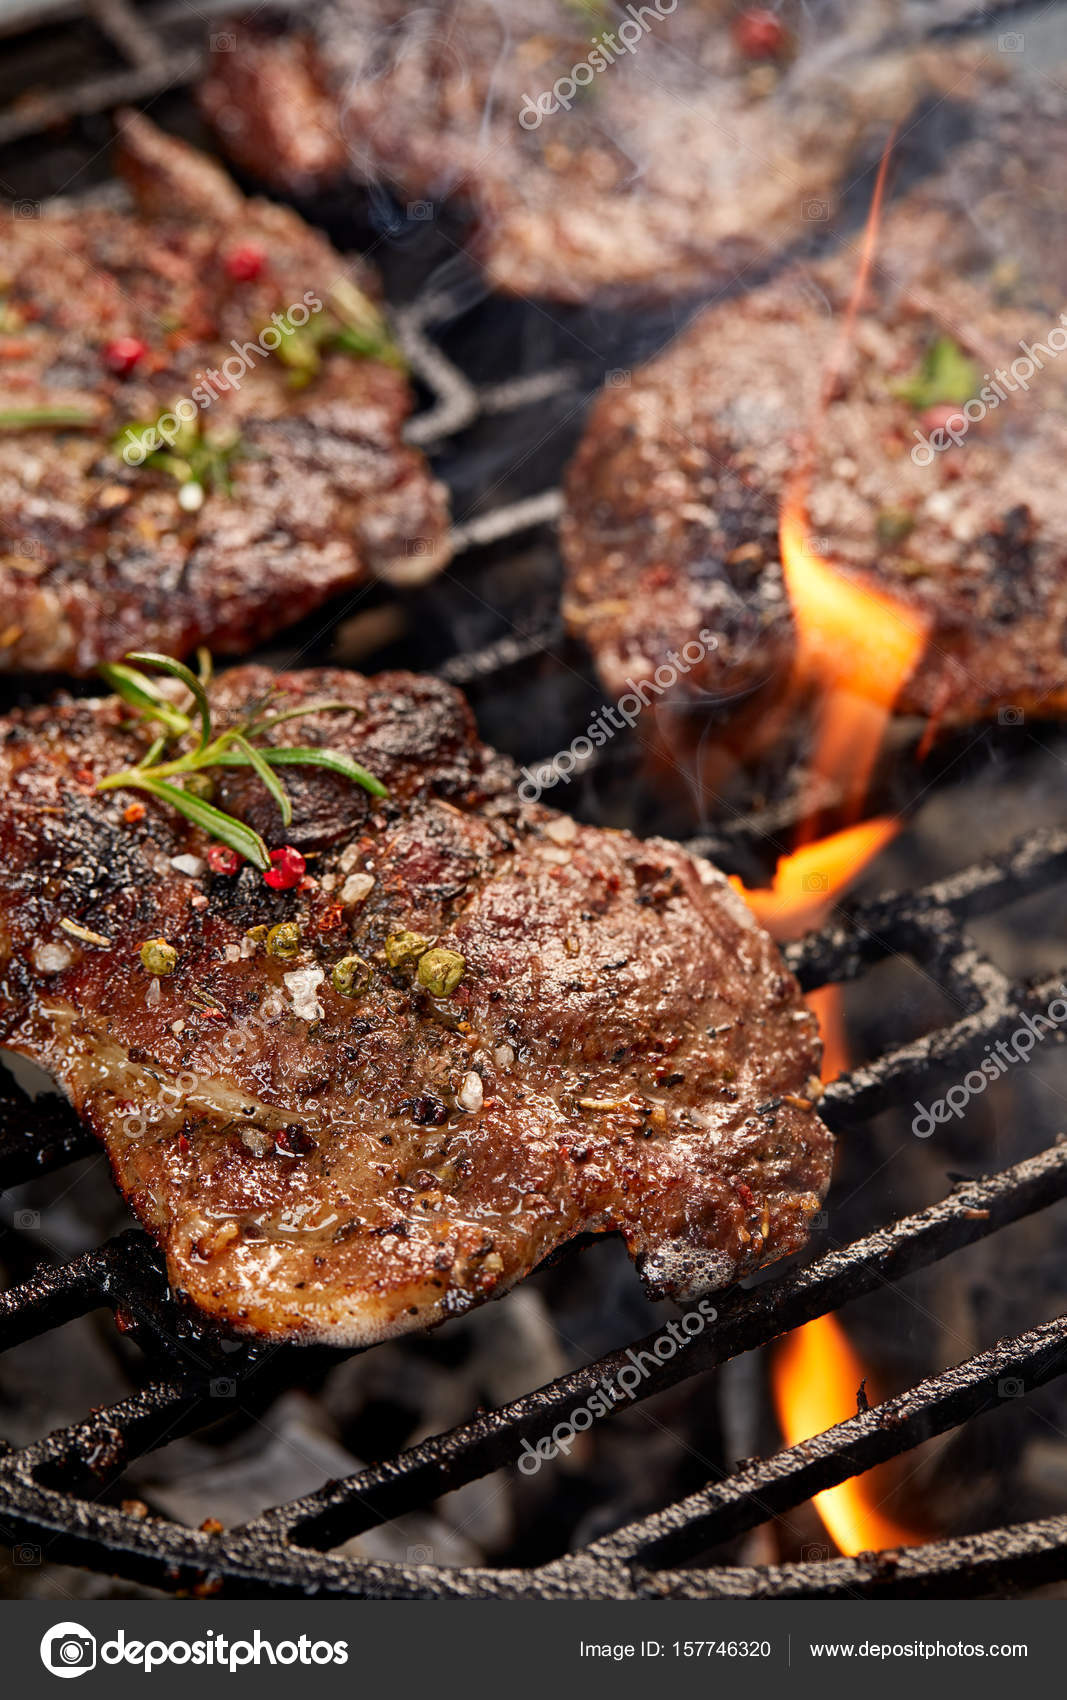 Hals grillt